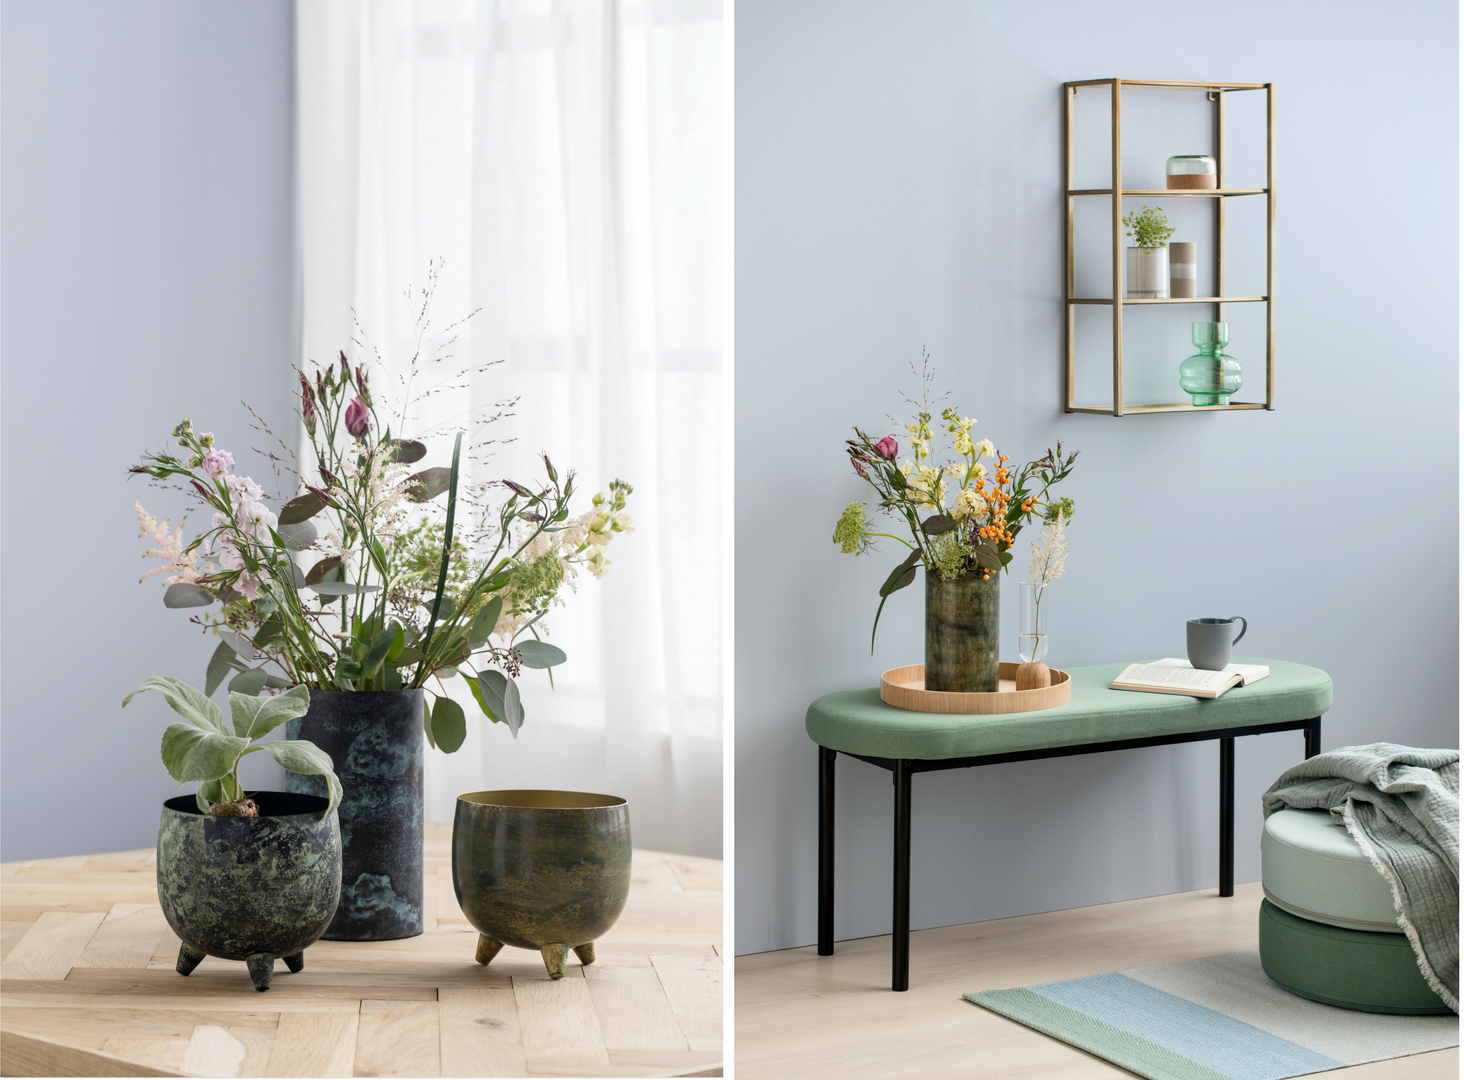 s strene grene une collection printani re et idyllique behind the do r. Black Bedroom Furniture Sets. Home Design Ideas